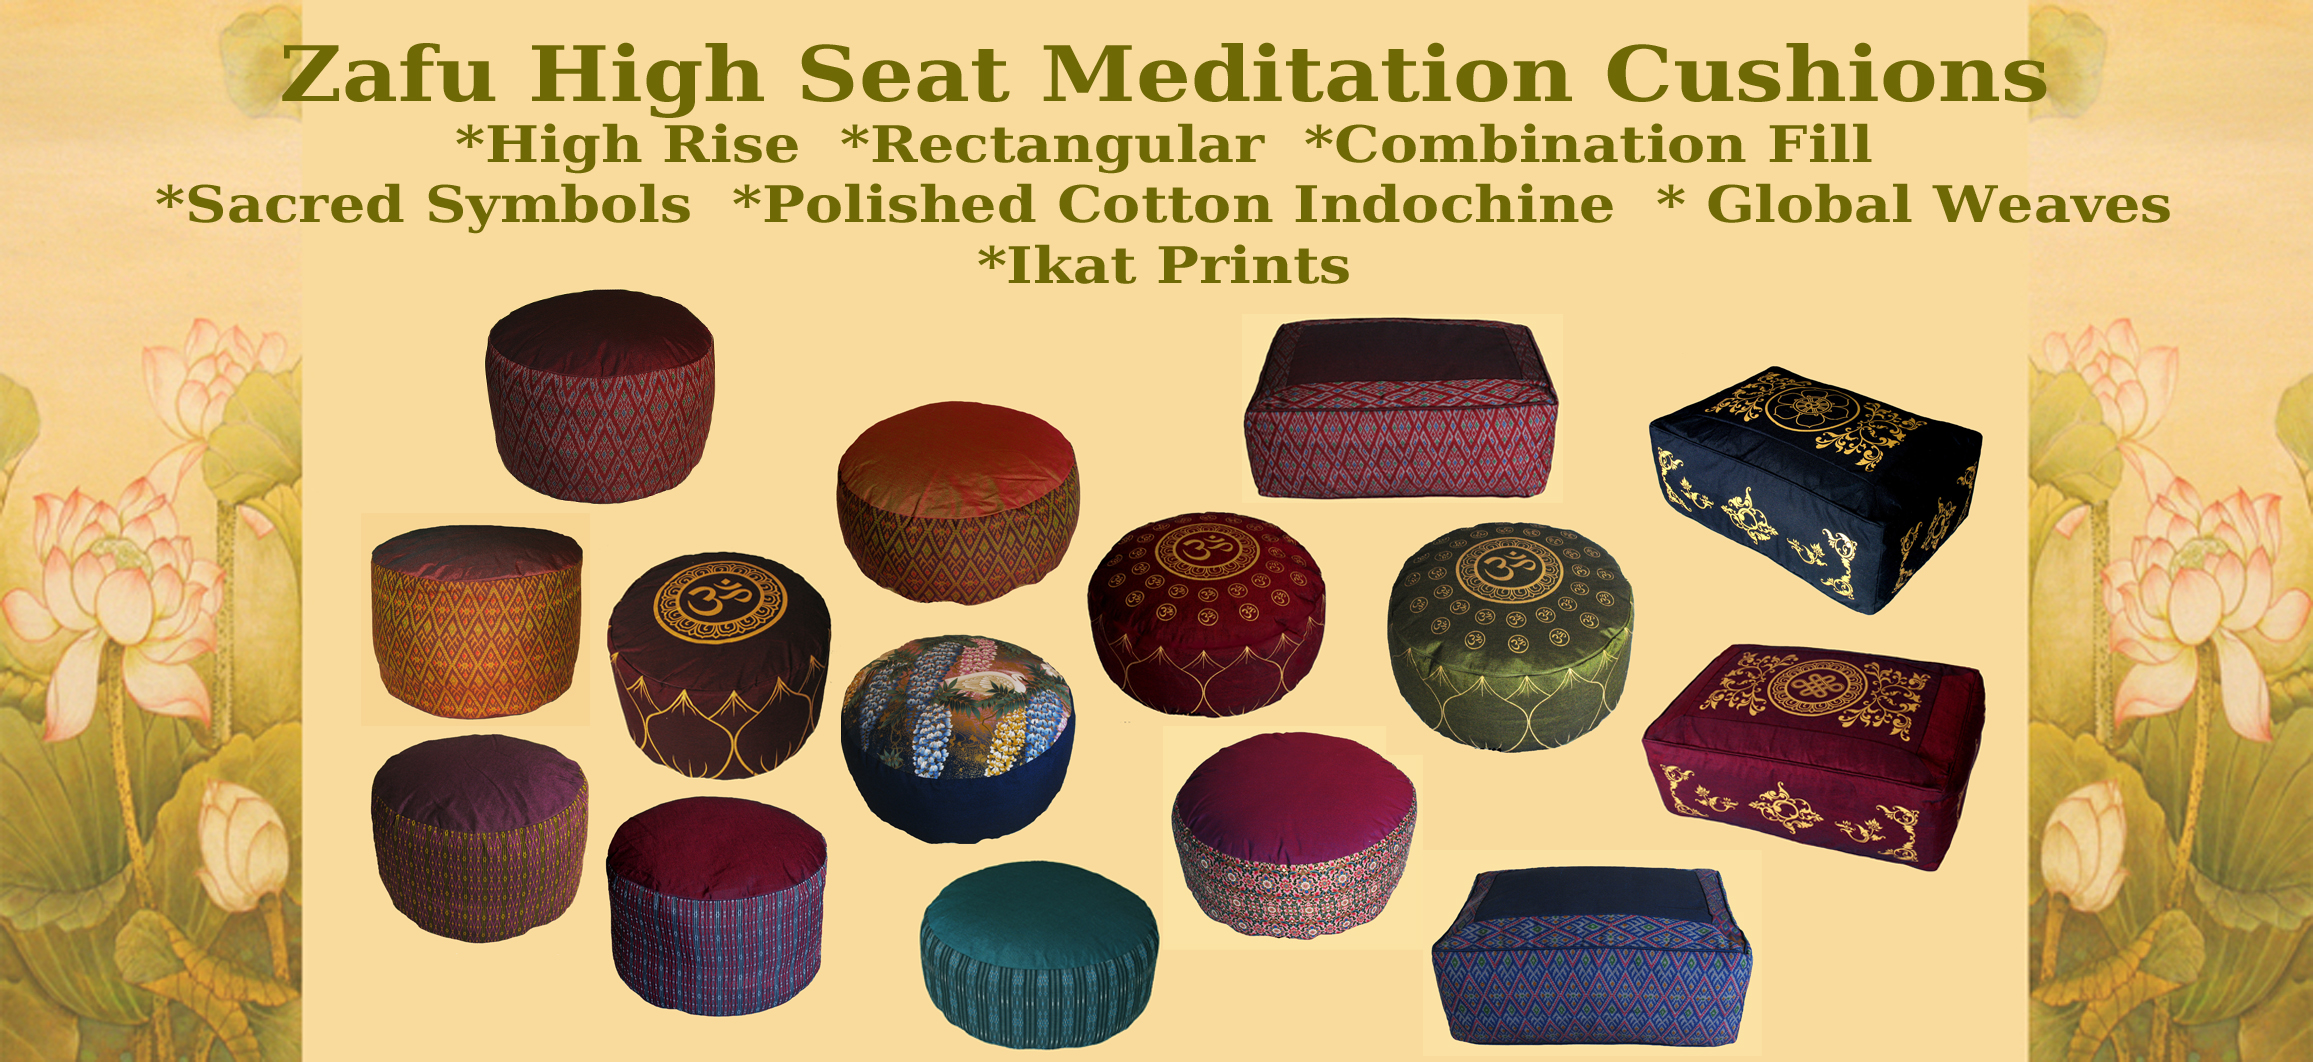 high-seat-zafu.jpg